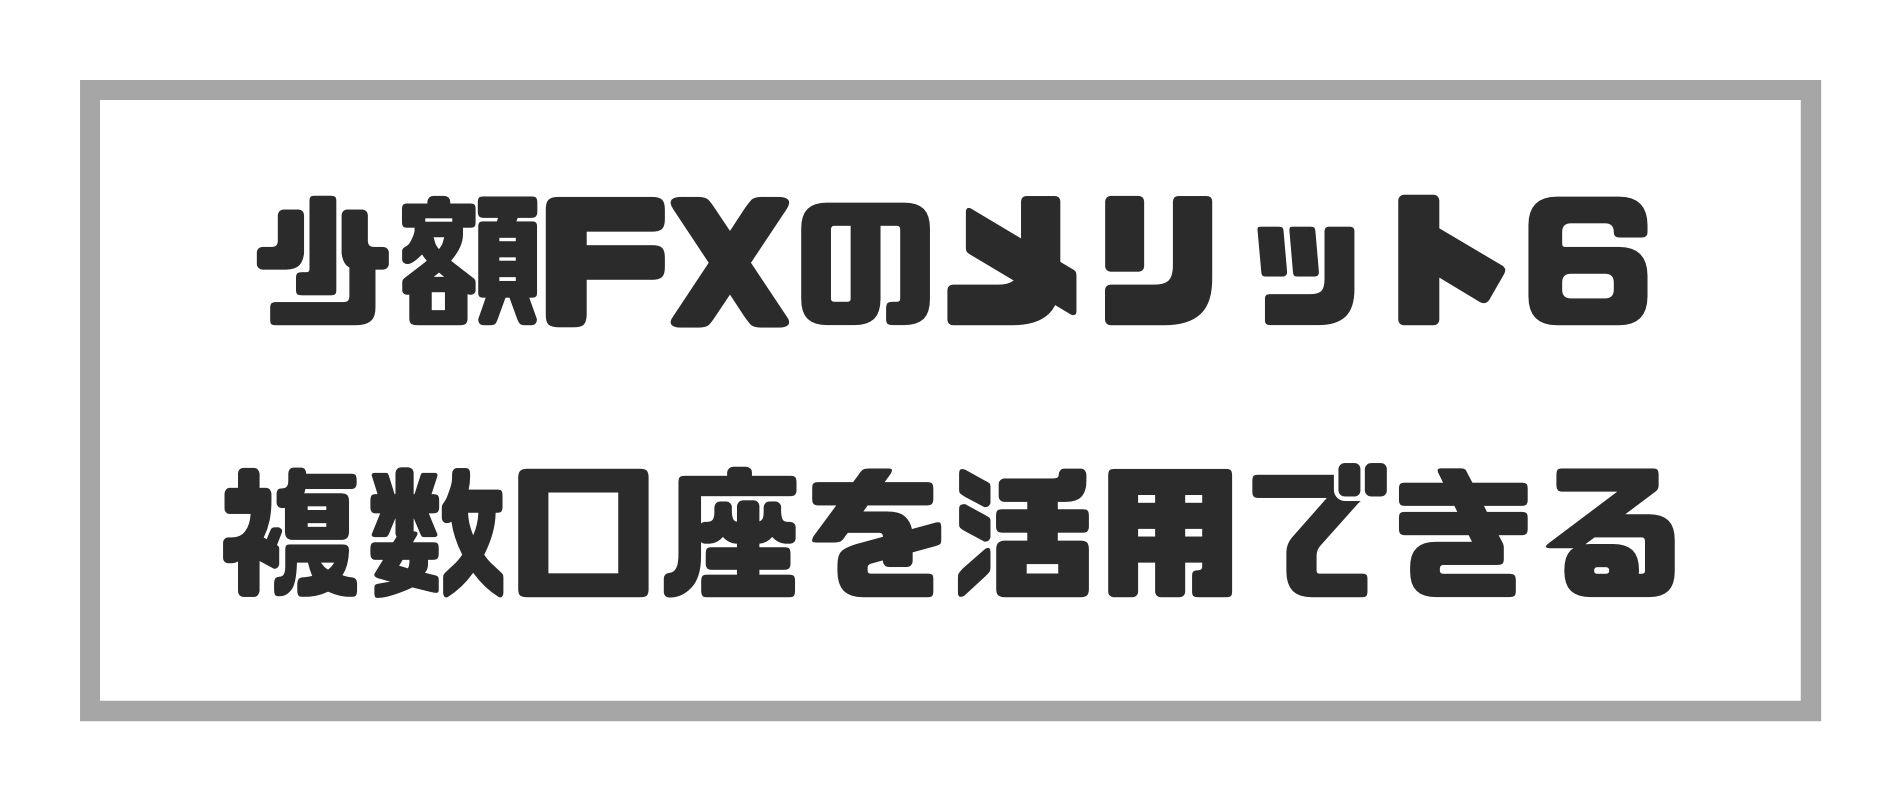 FX少額_少額取引は複数口座を有効活用できる